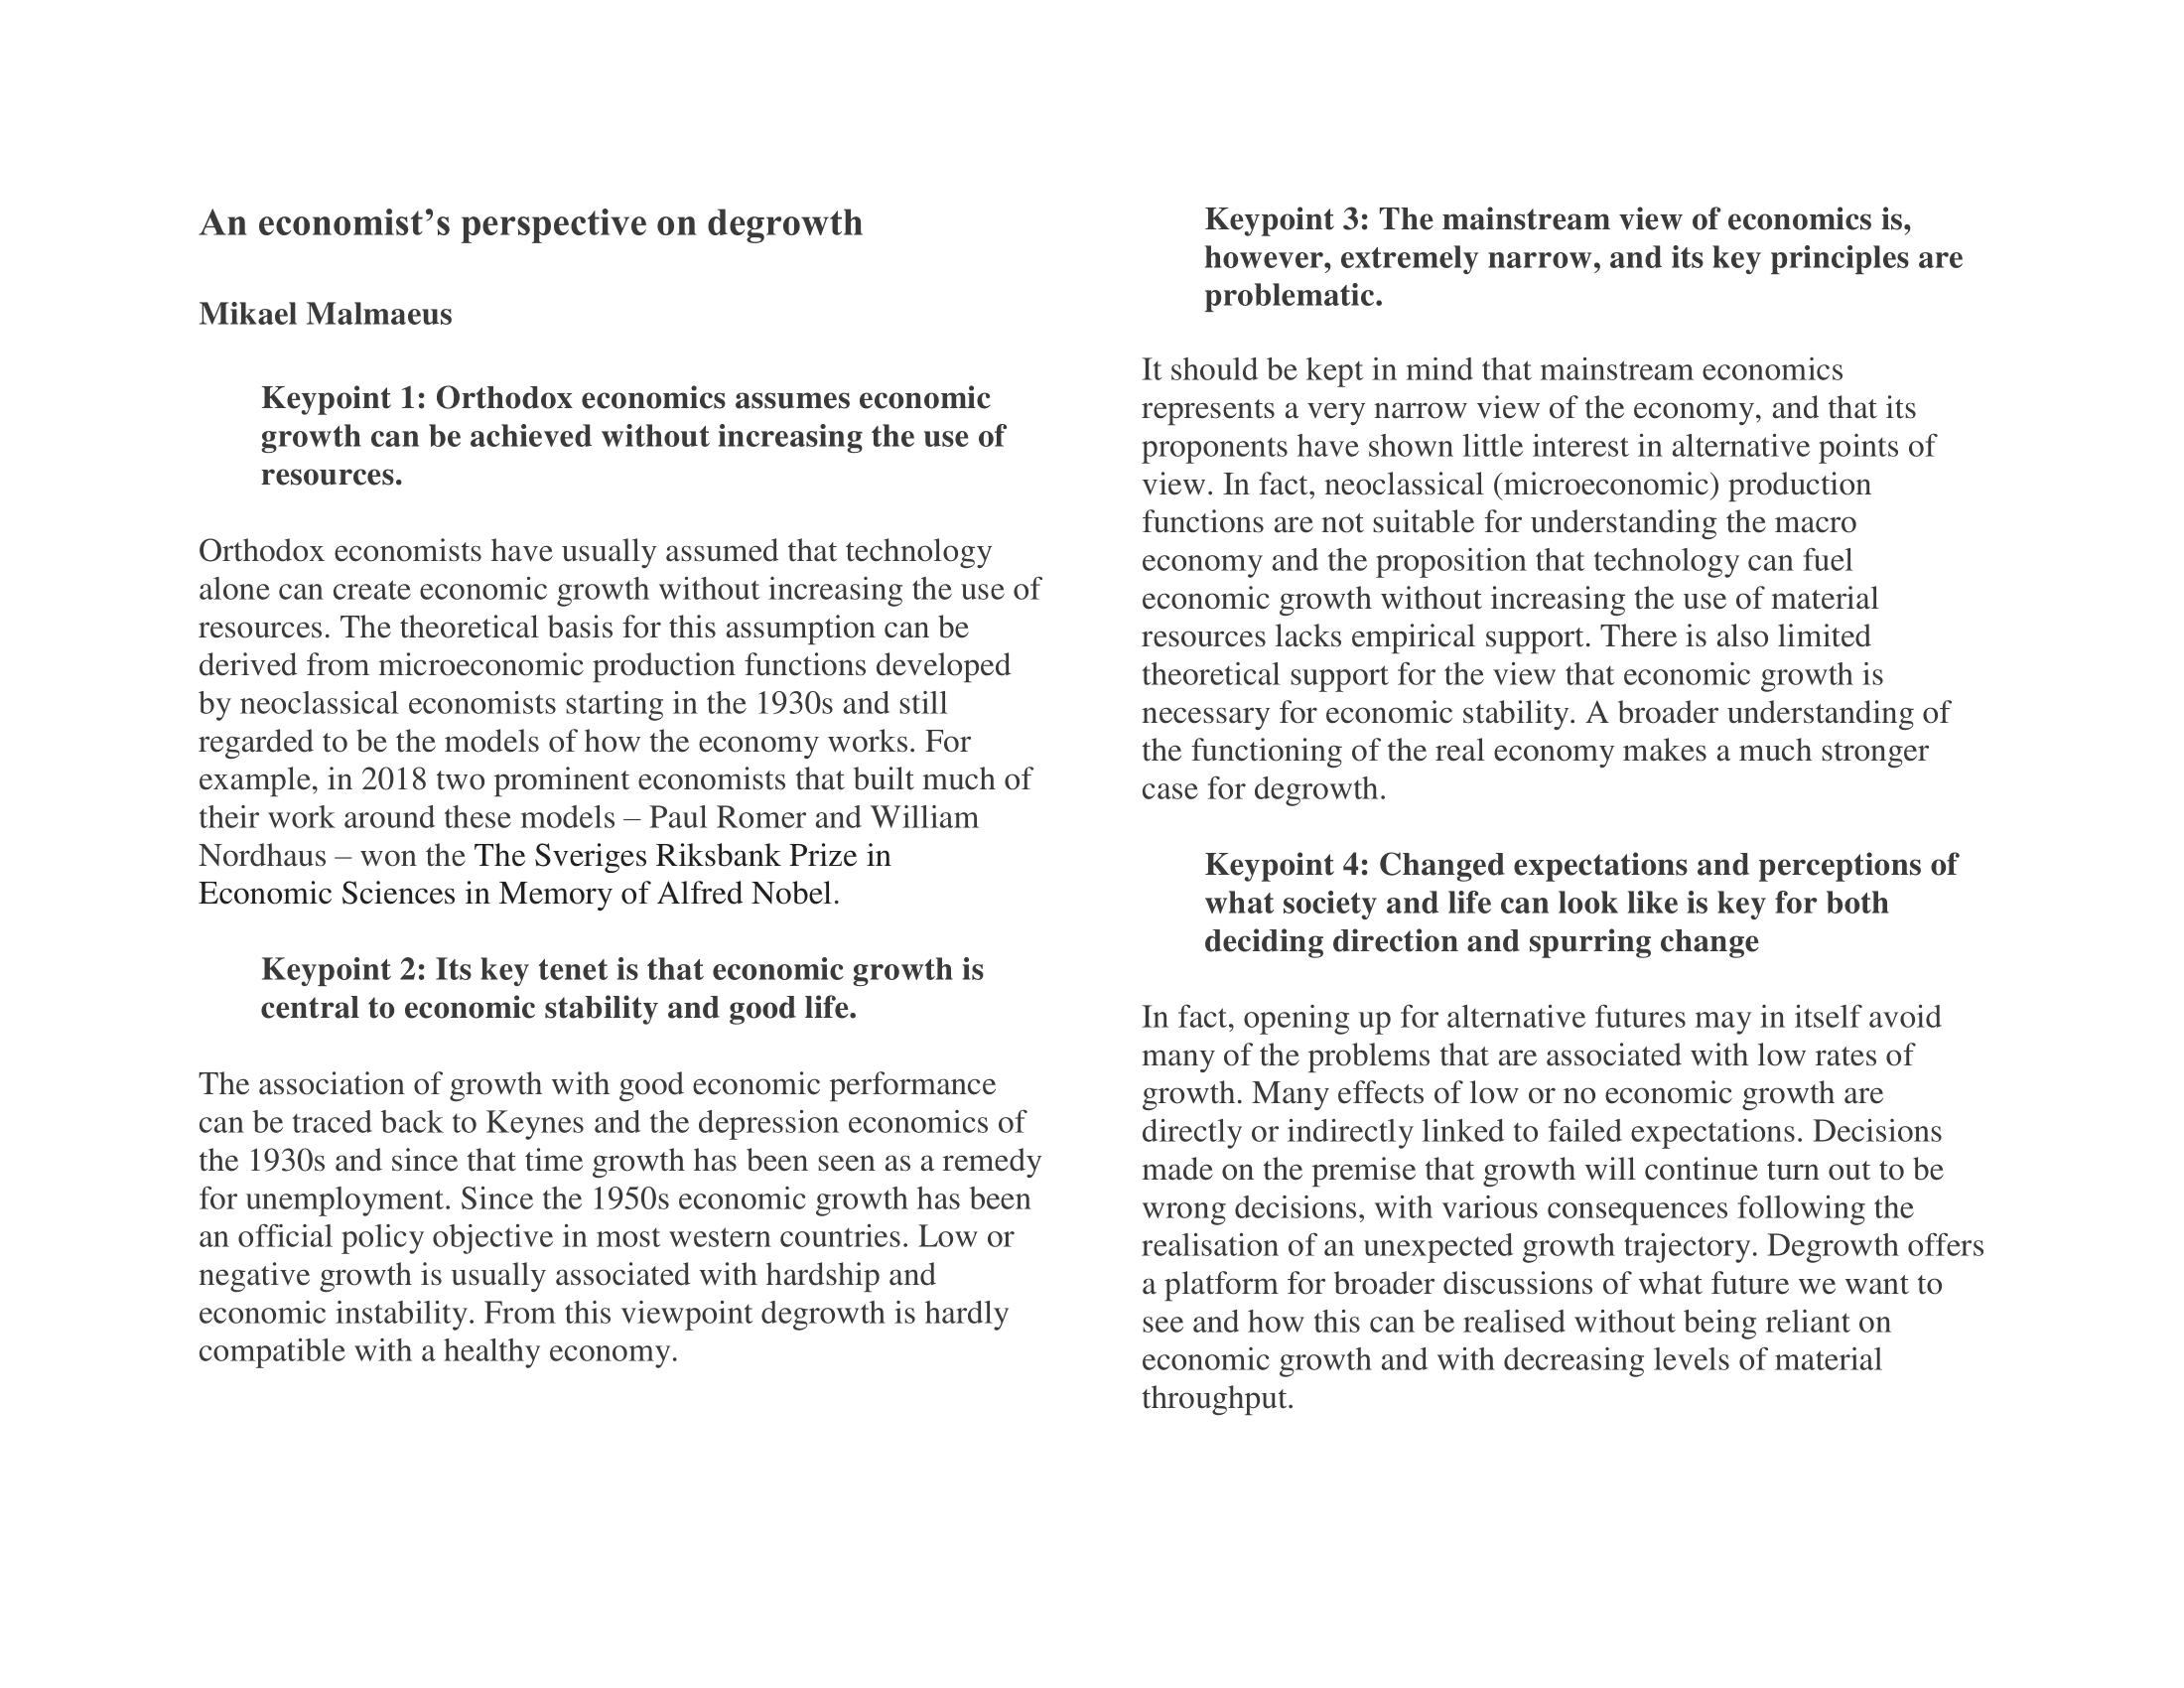 Economist's perspective-2.png